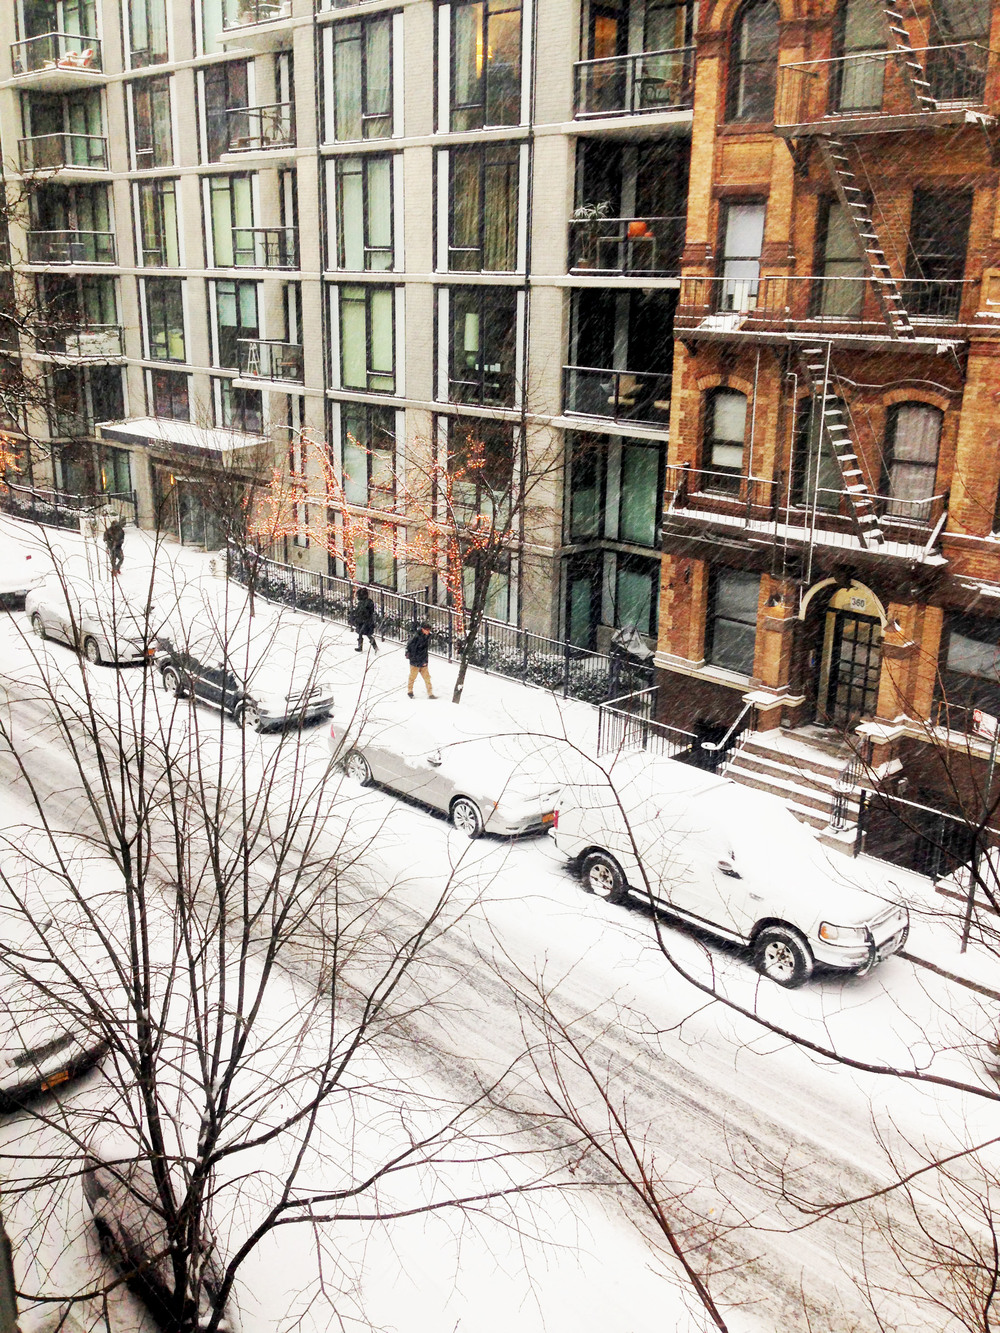 snowy 53rd st